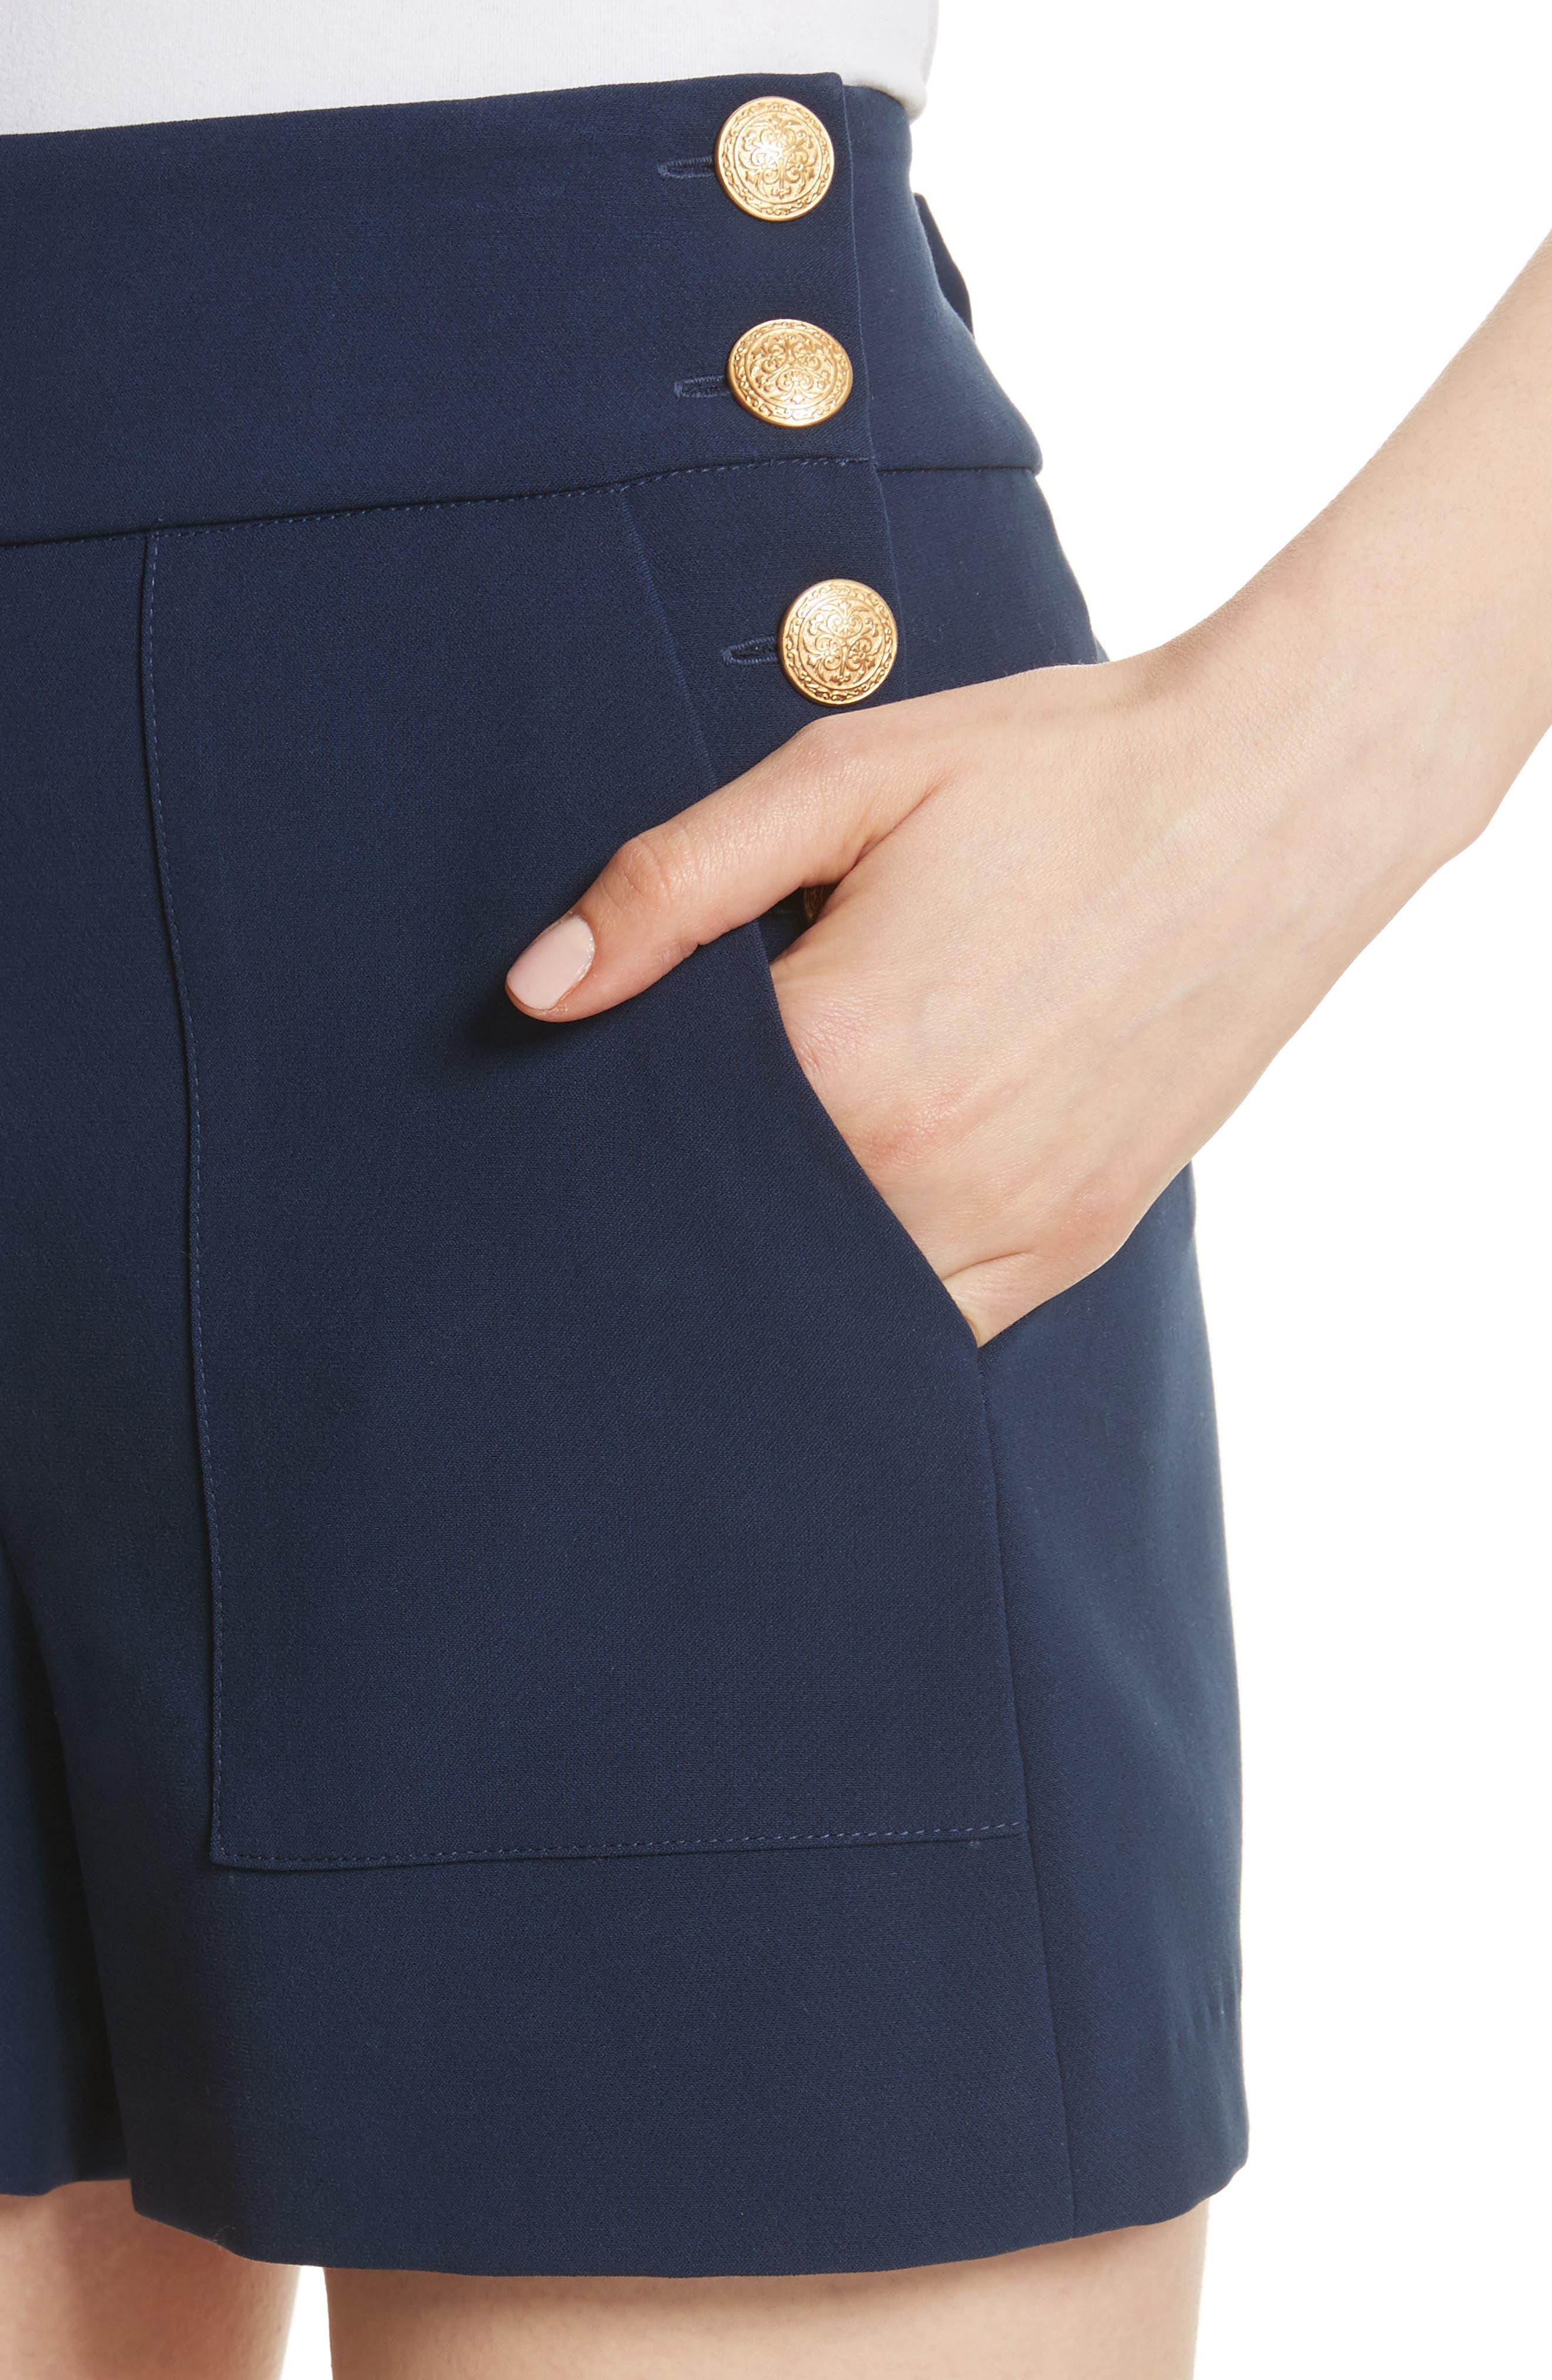 Donald High Waist Sailor Shorts,                             Alternate thumbnail 4, color,                             Sapphire